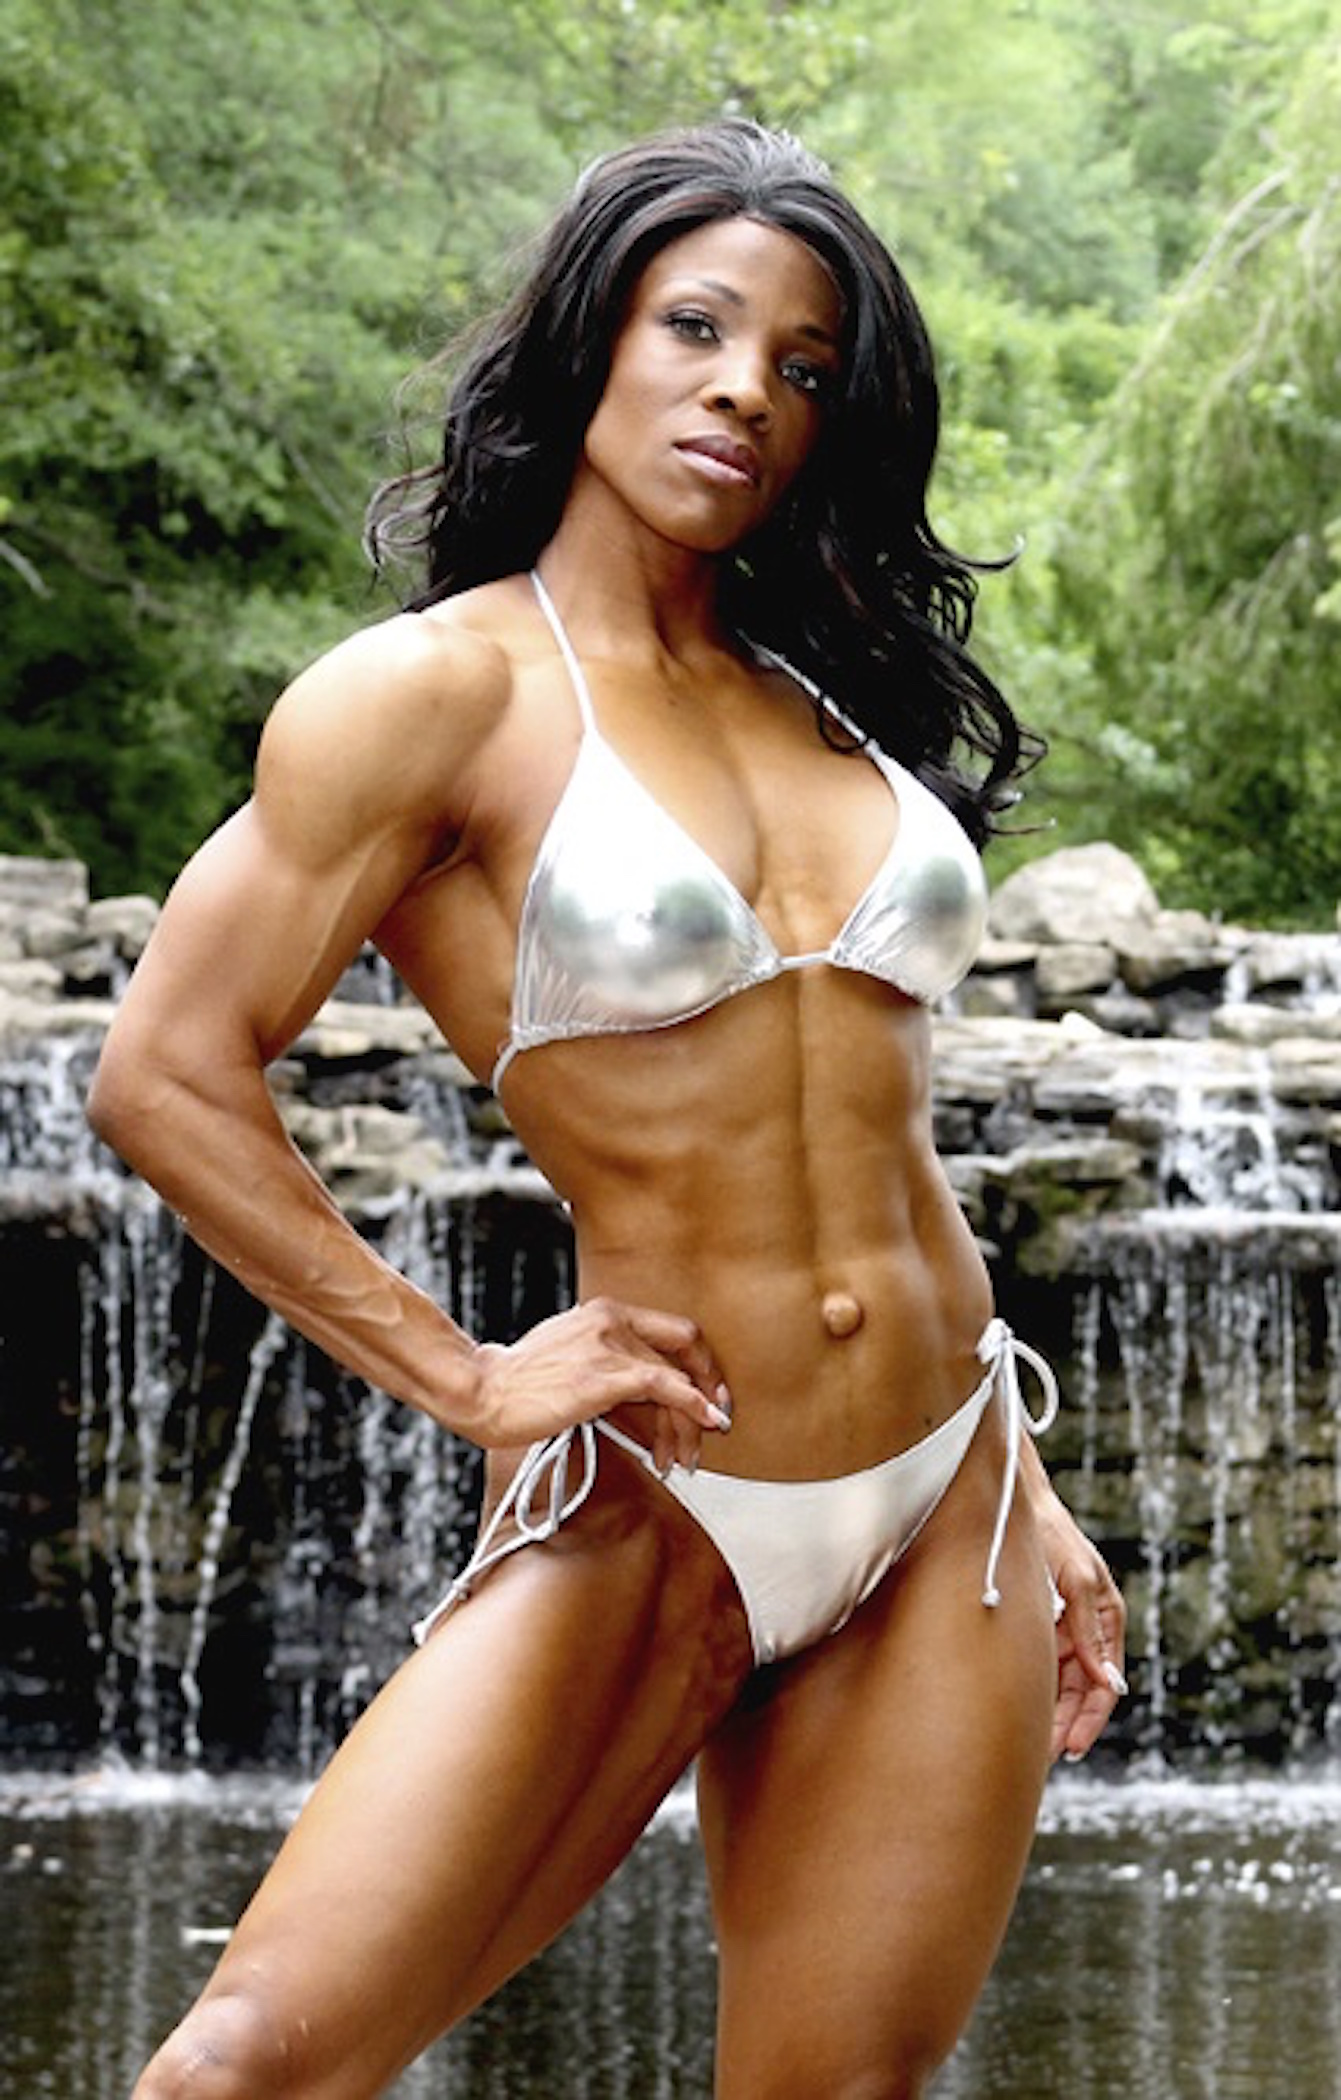 IFBB Figure Pro Mayla Ash